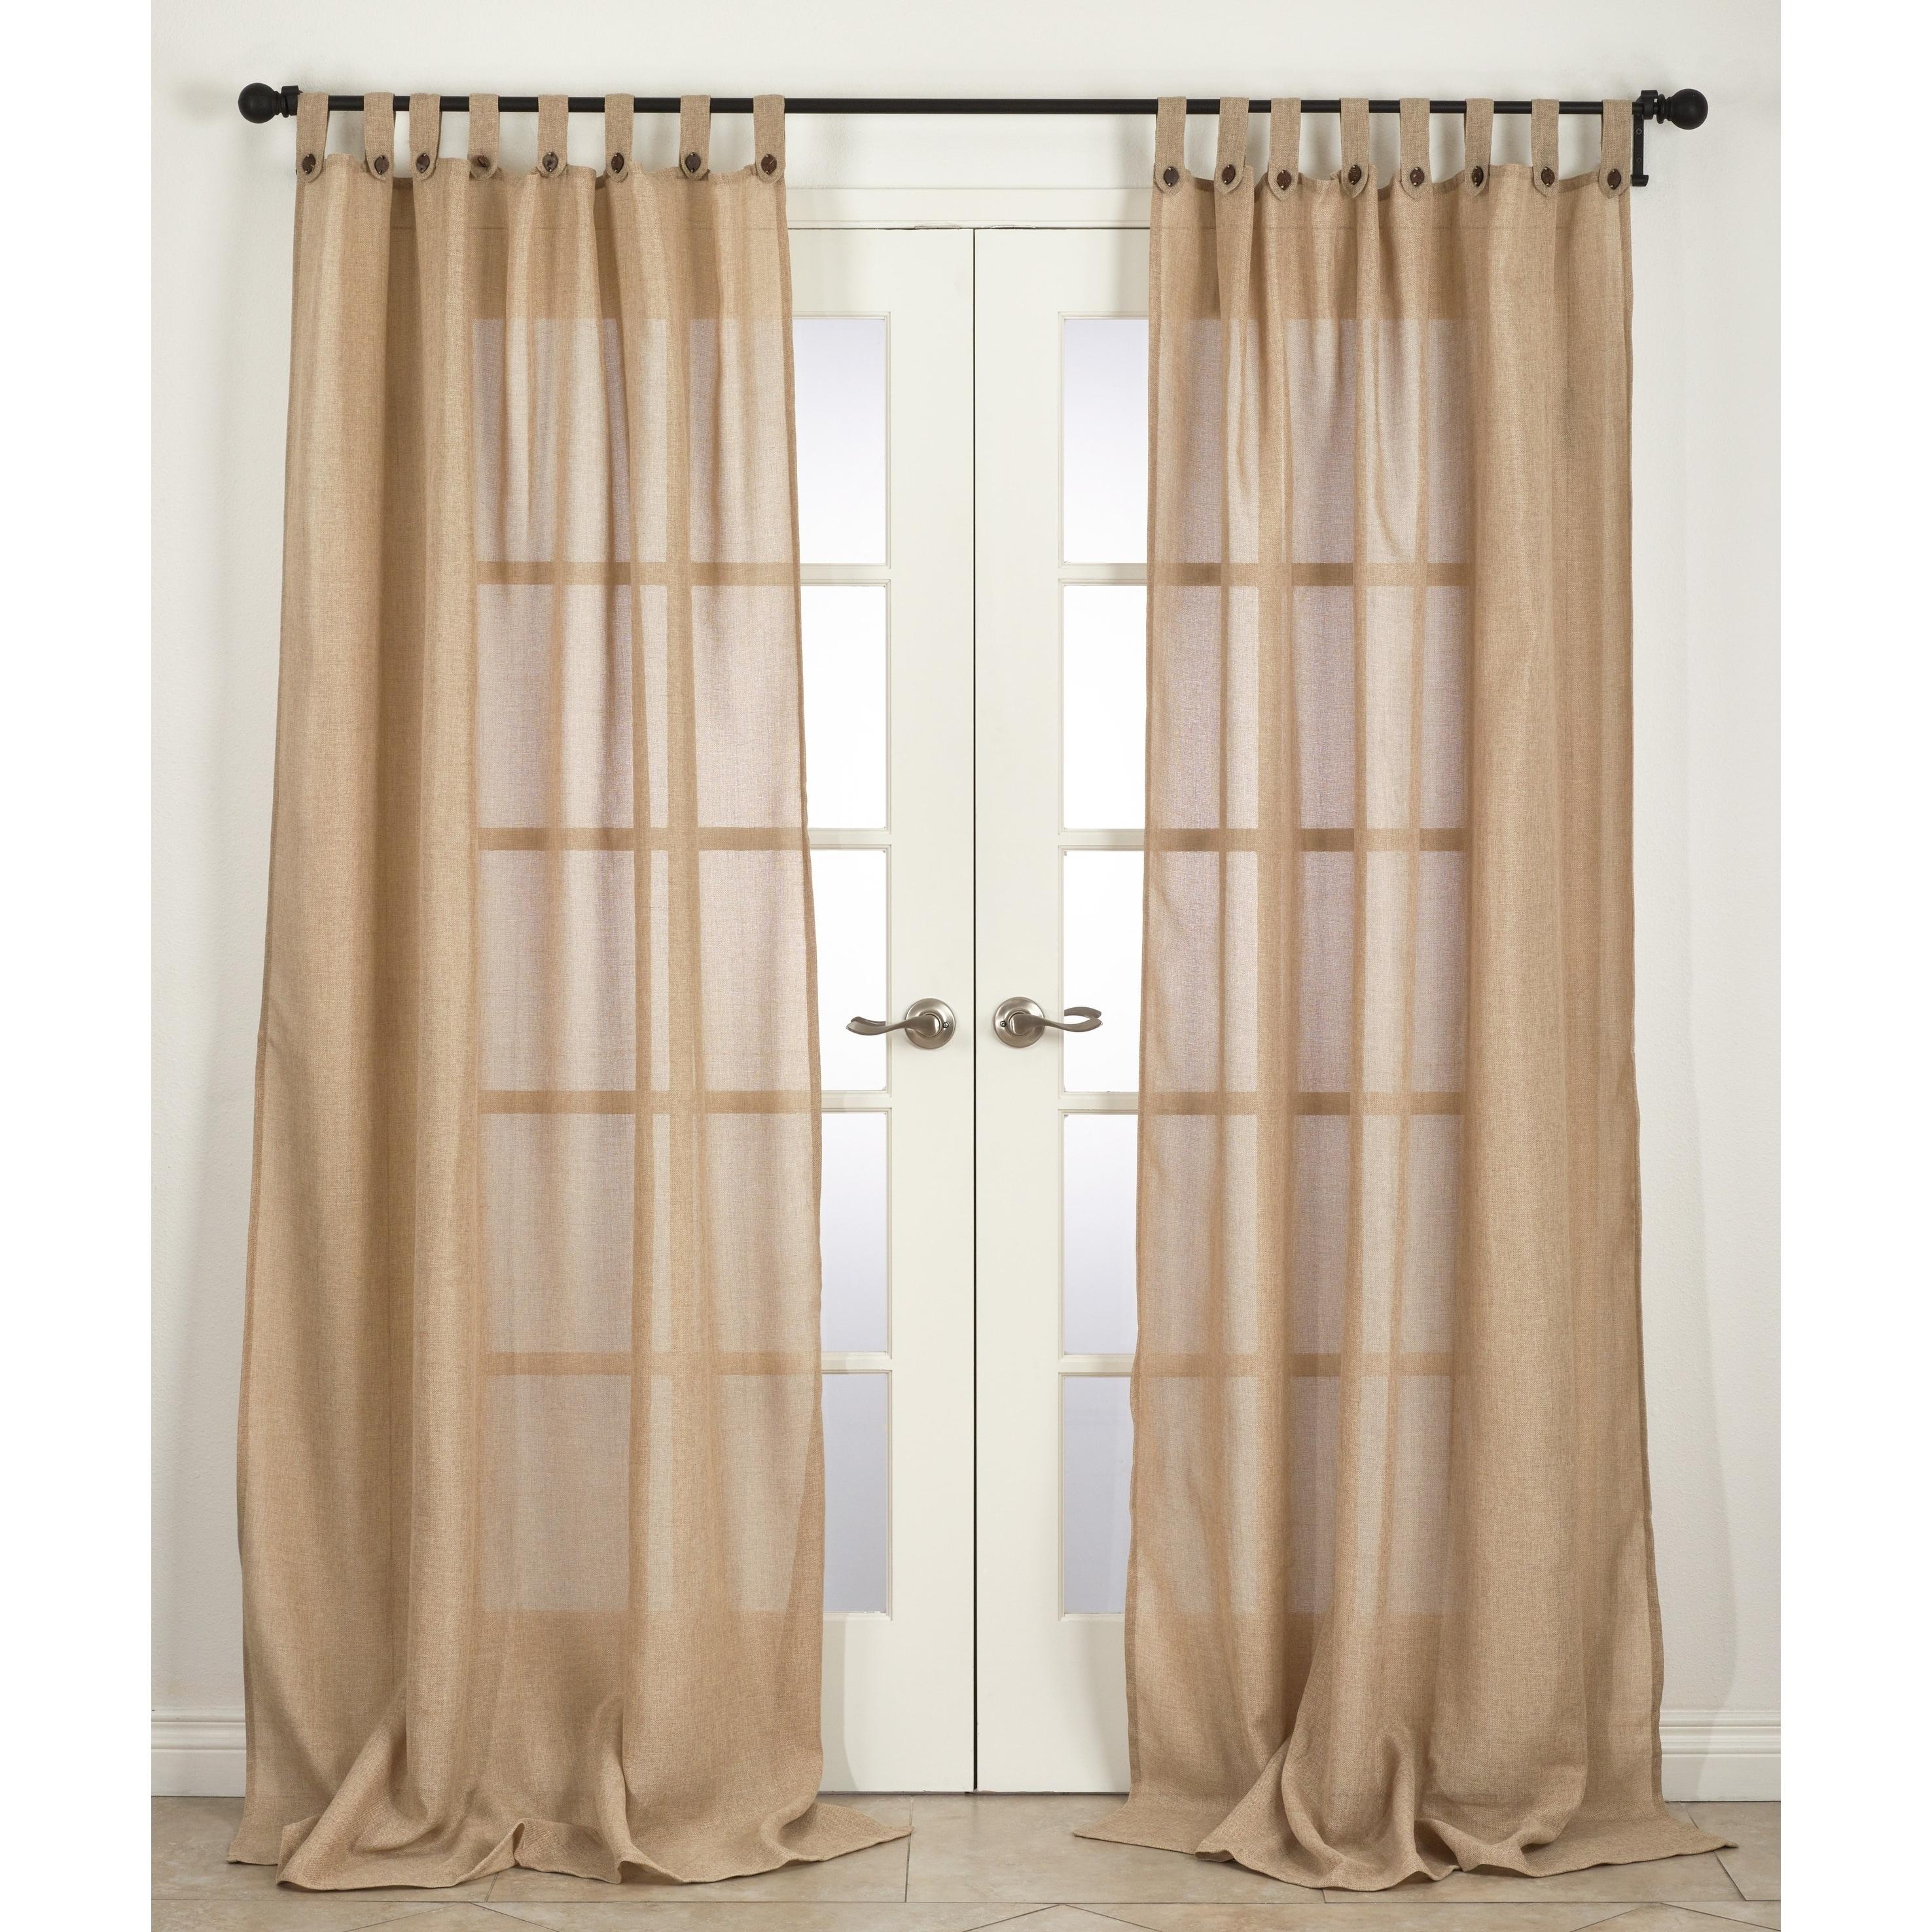 Saro Classic Solid Semi Sheer Tab Top Single Curtain Panel For Tab Top Sheer Single Curtain Panels (View 27 of 30)